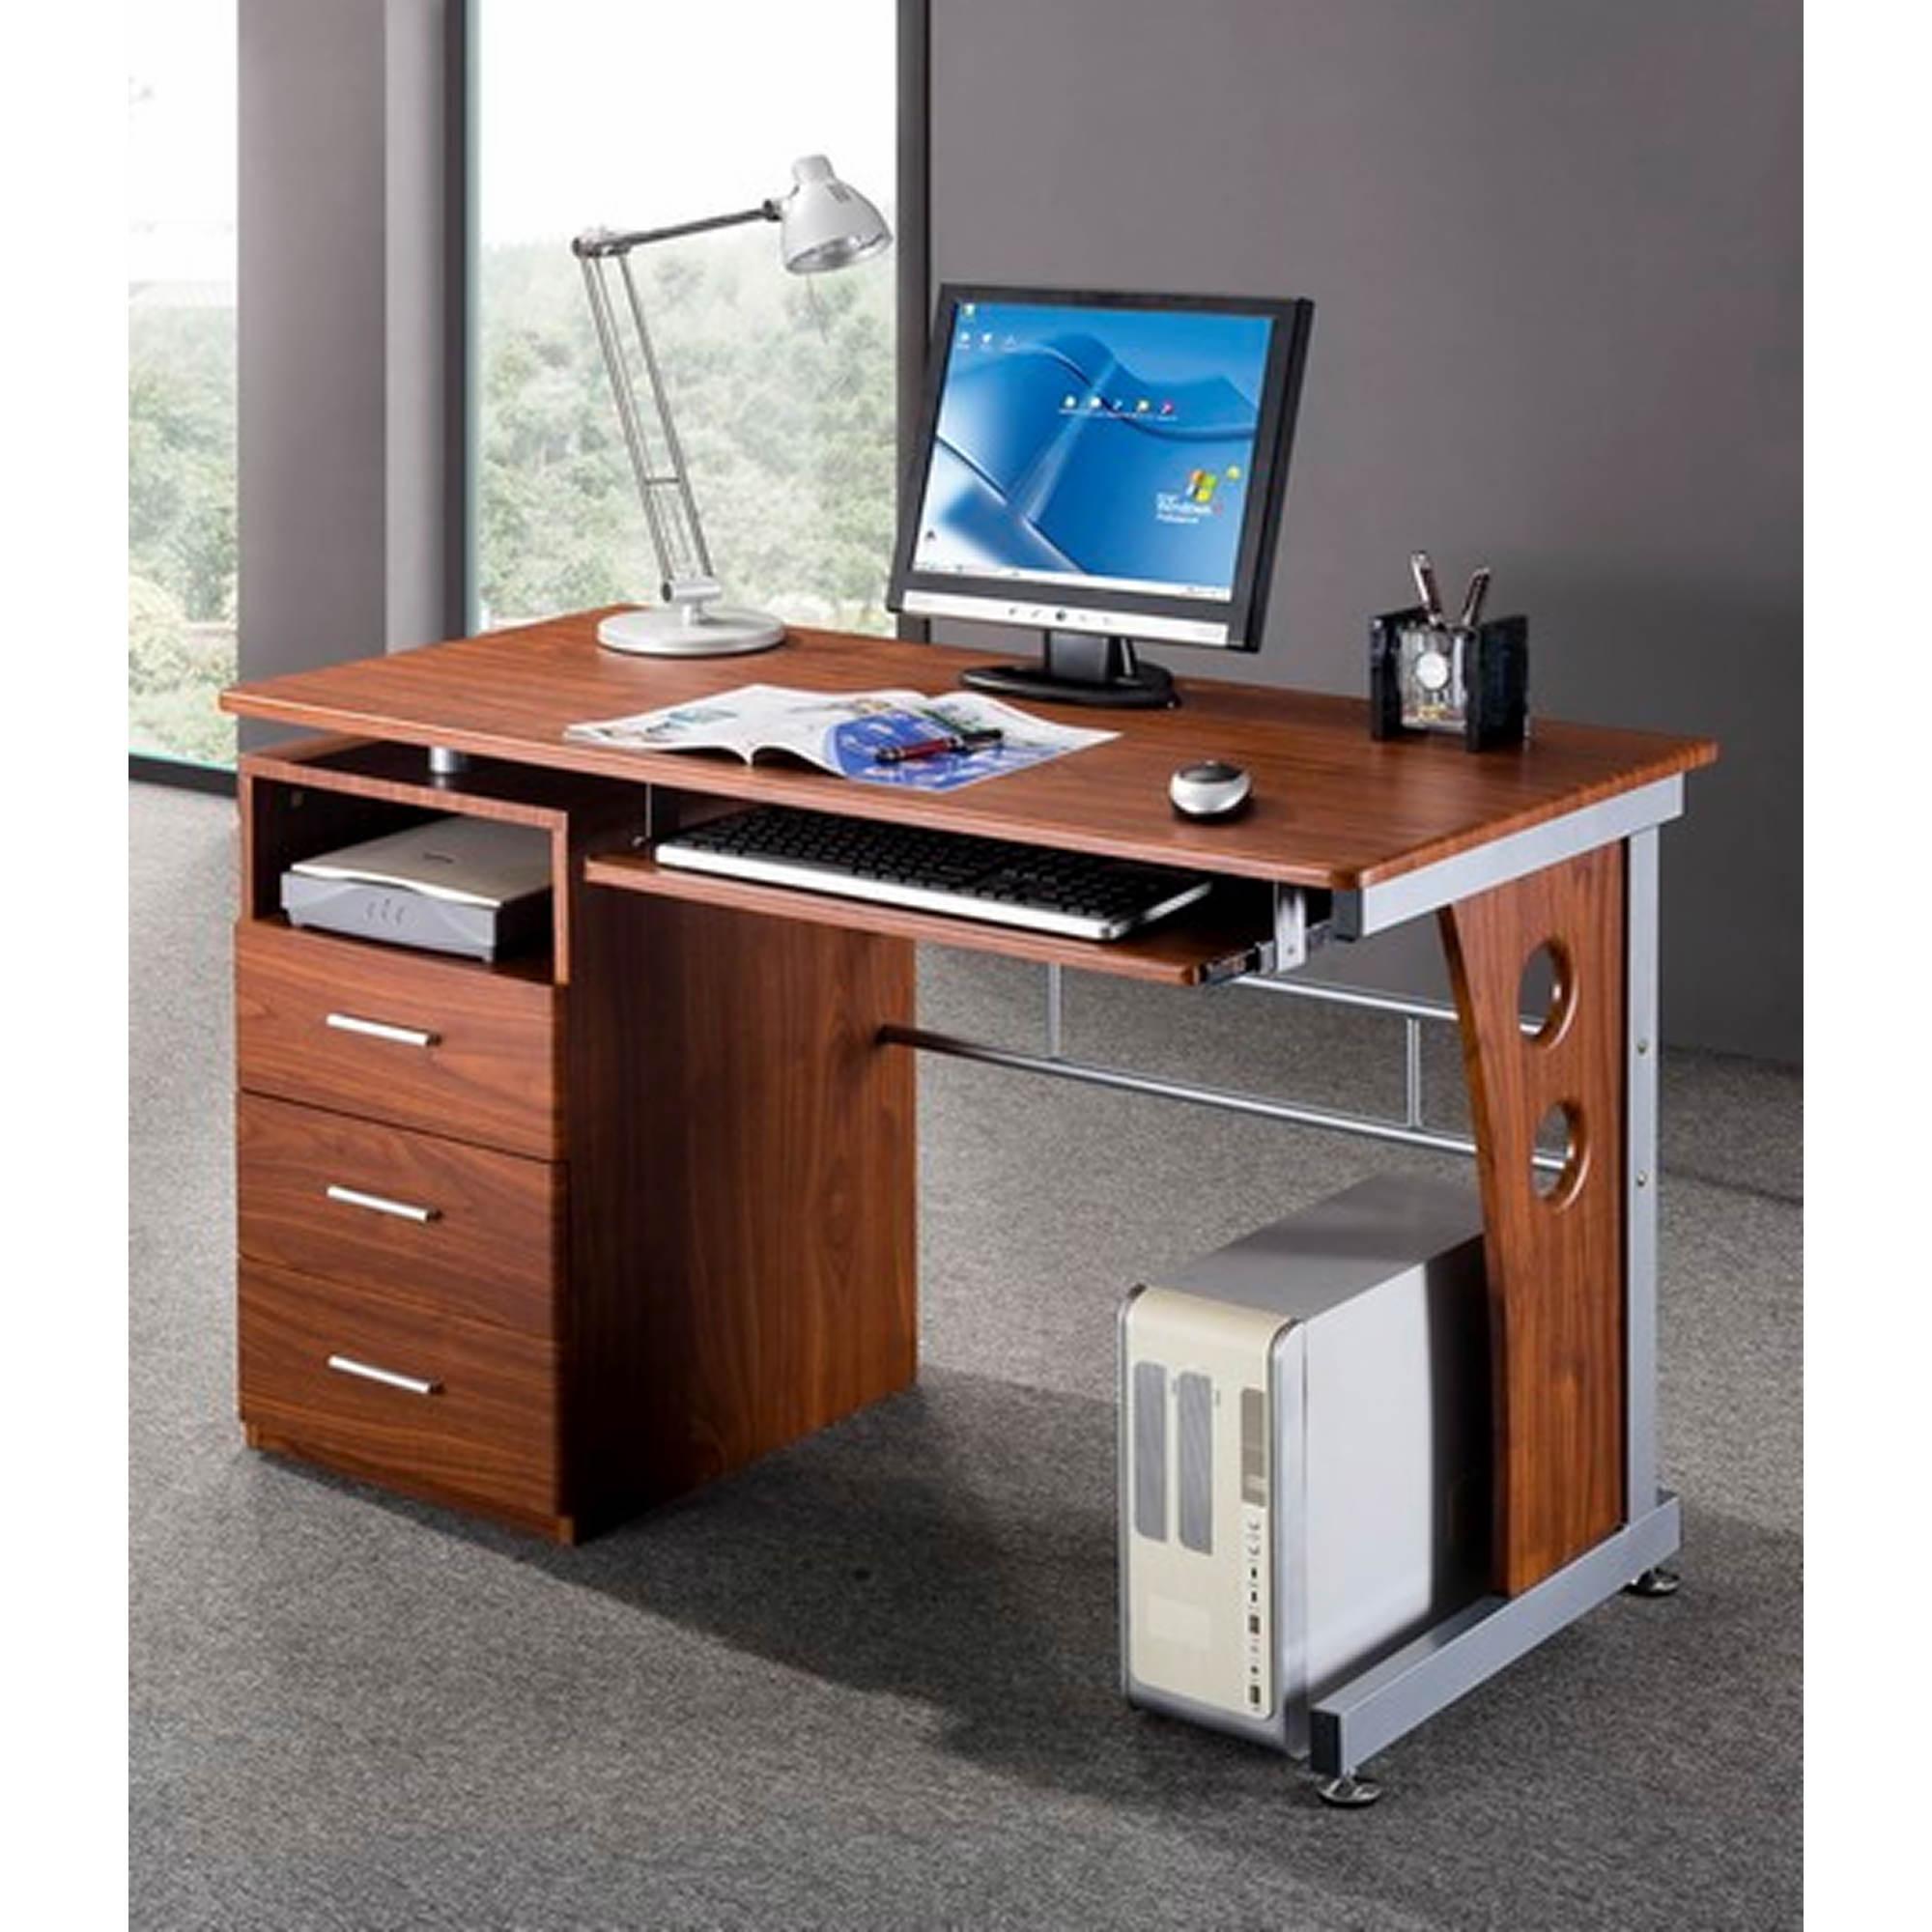 Techni mobili computer desk with storage mahogany bj 39 s for Mobili computer